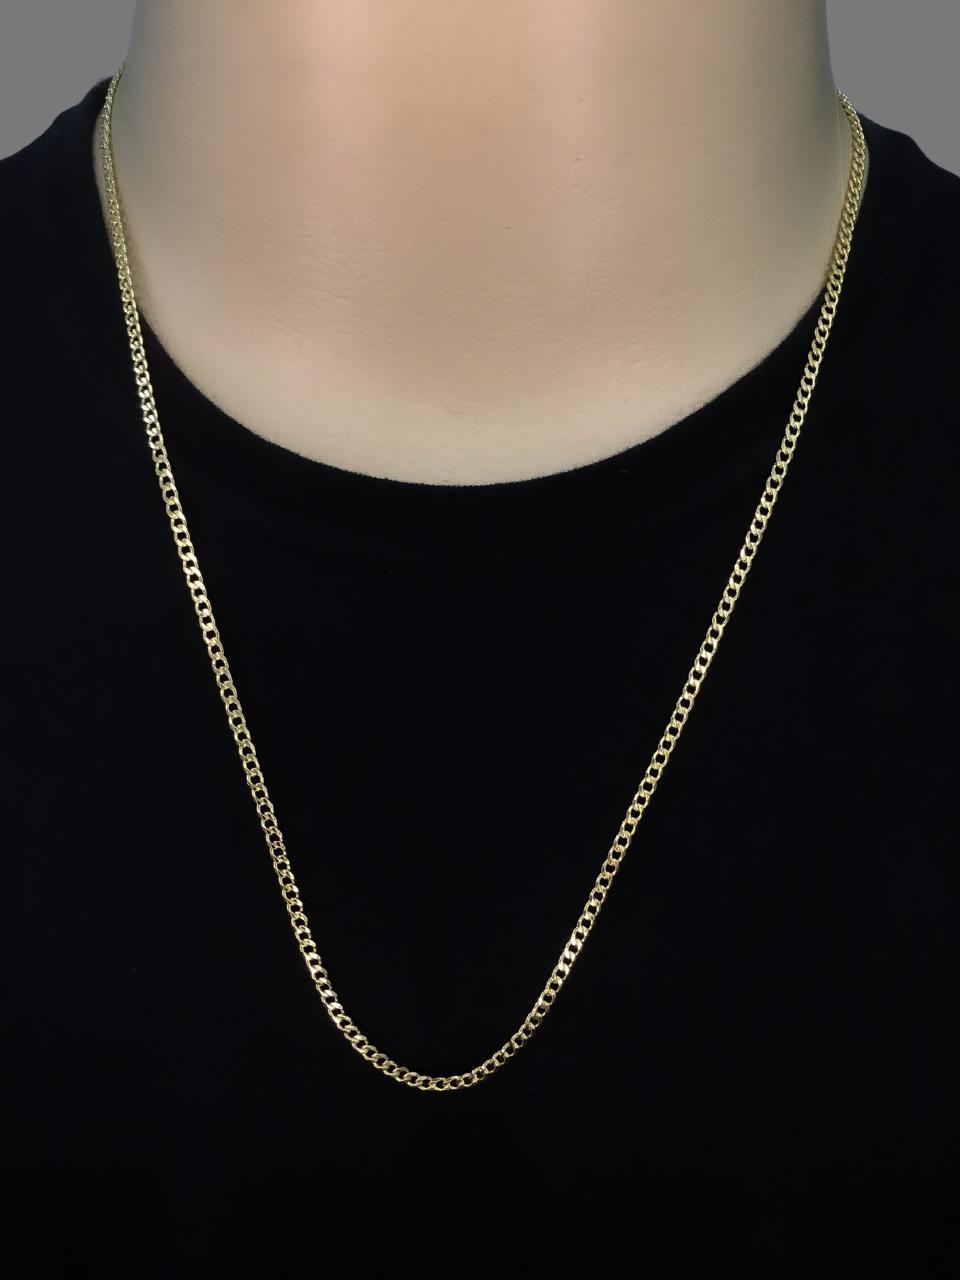 Corrente Grumet -  3 milímetros - 70 Centímetros - fecho Gaveta - Banhado a ouro 18 k